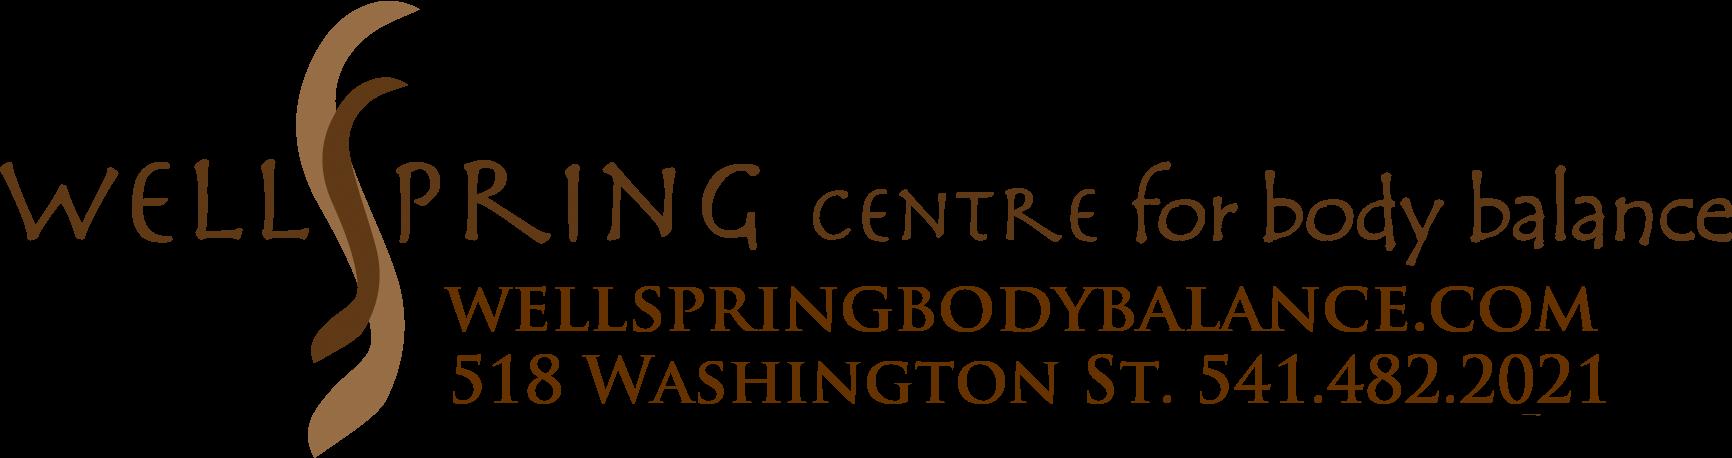 Wellspring Body Balance